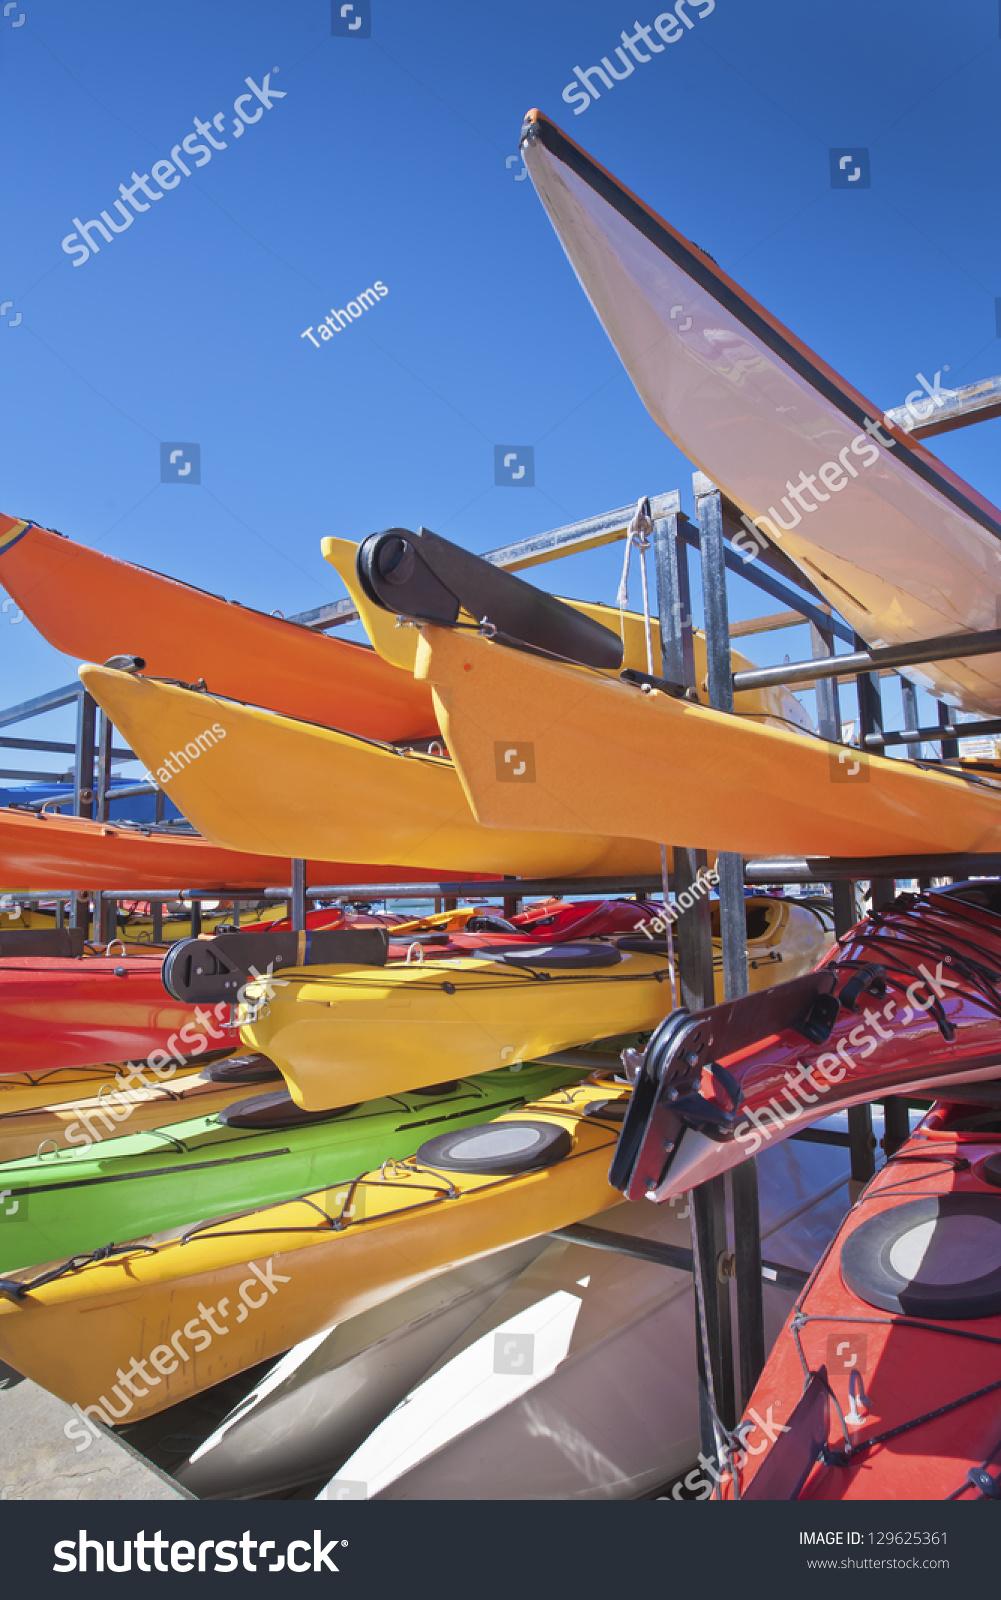 Canoe storage at lake harbor.